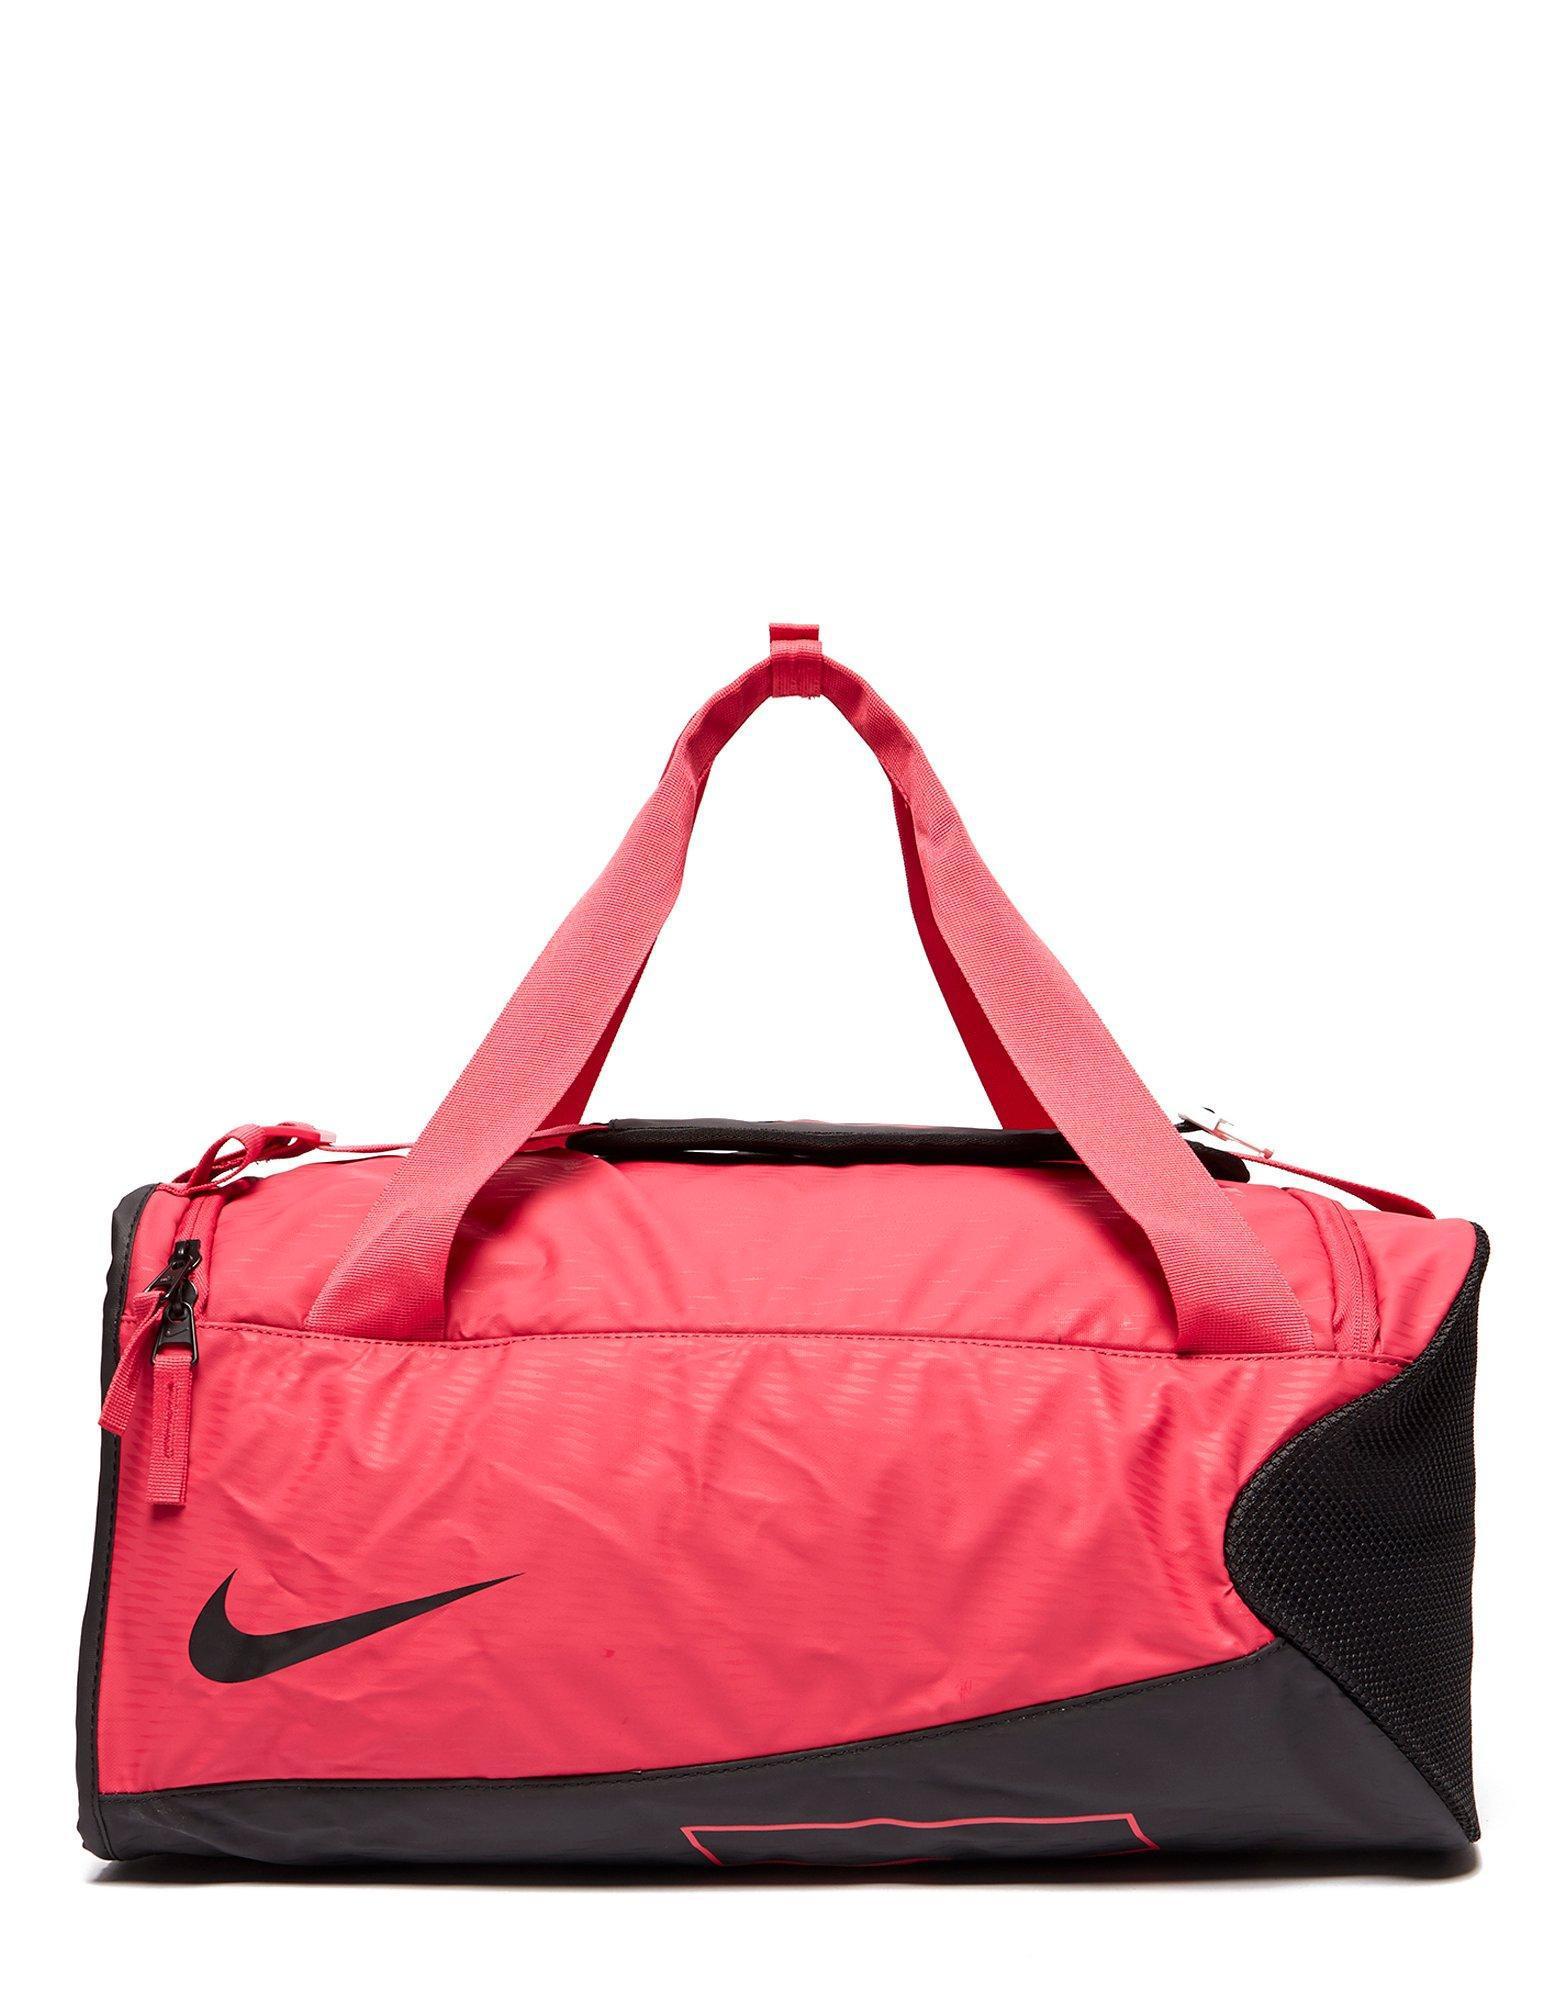 5c631e676c Nike Alpha Adapt Crossbody Duffel Trainer Gym Bag Backpack 2in1 BA5257-010  Black